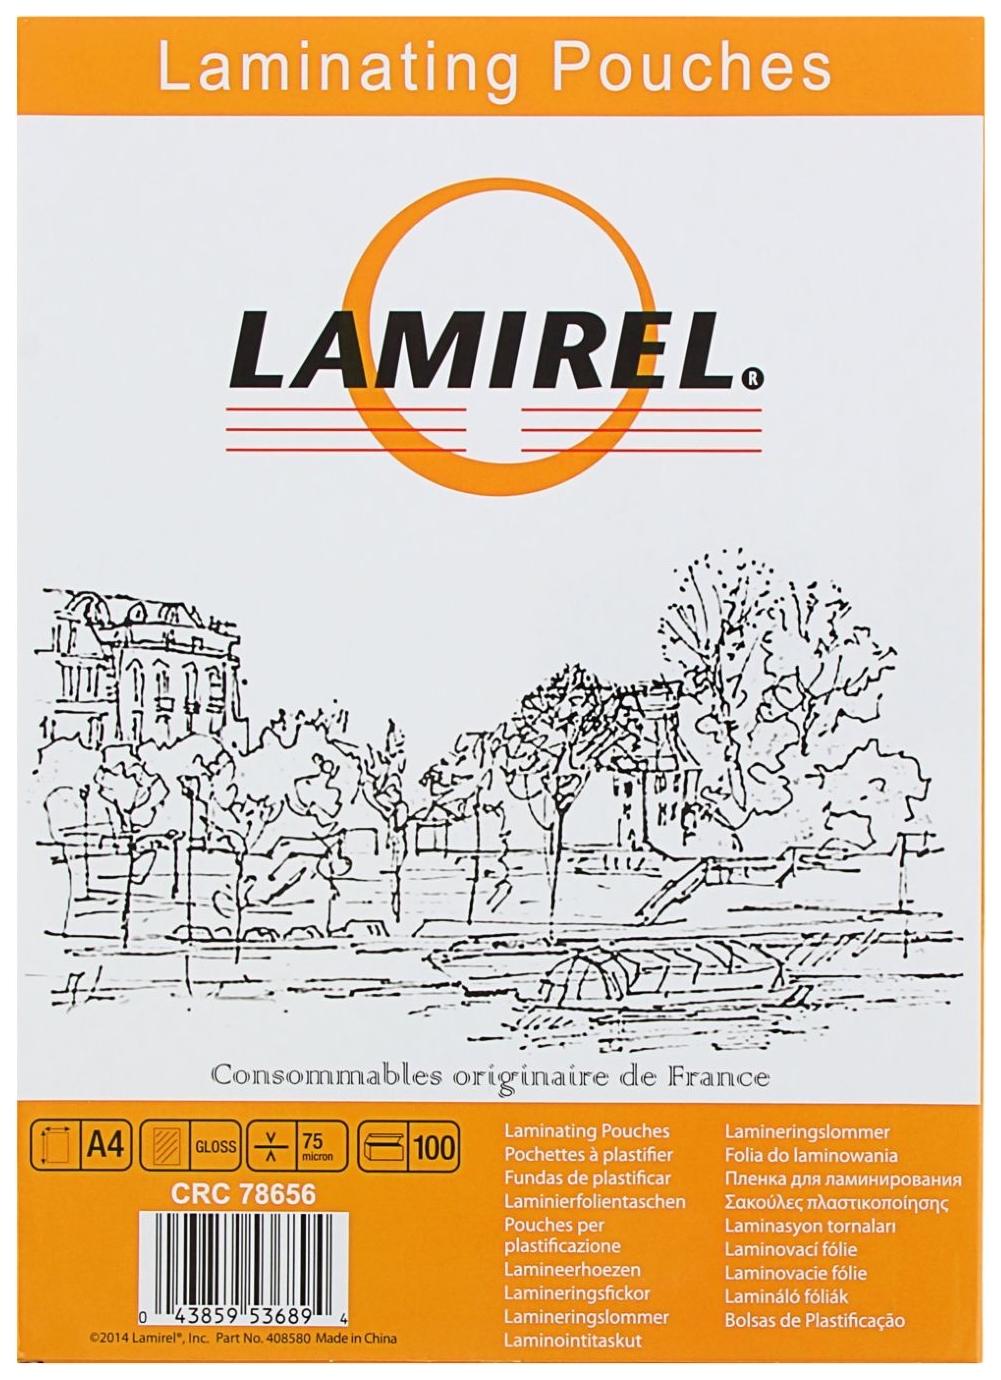 Пленка для ламинирования Fellowes Lamirel CRC-78656 А4 75мкм 100 шт. фото